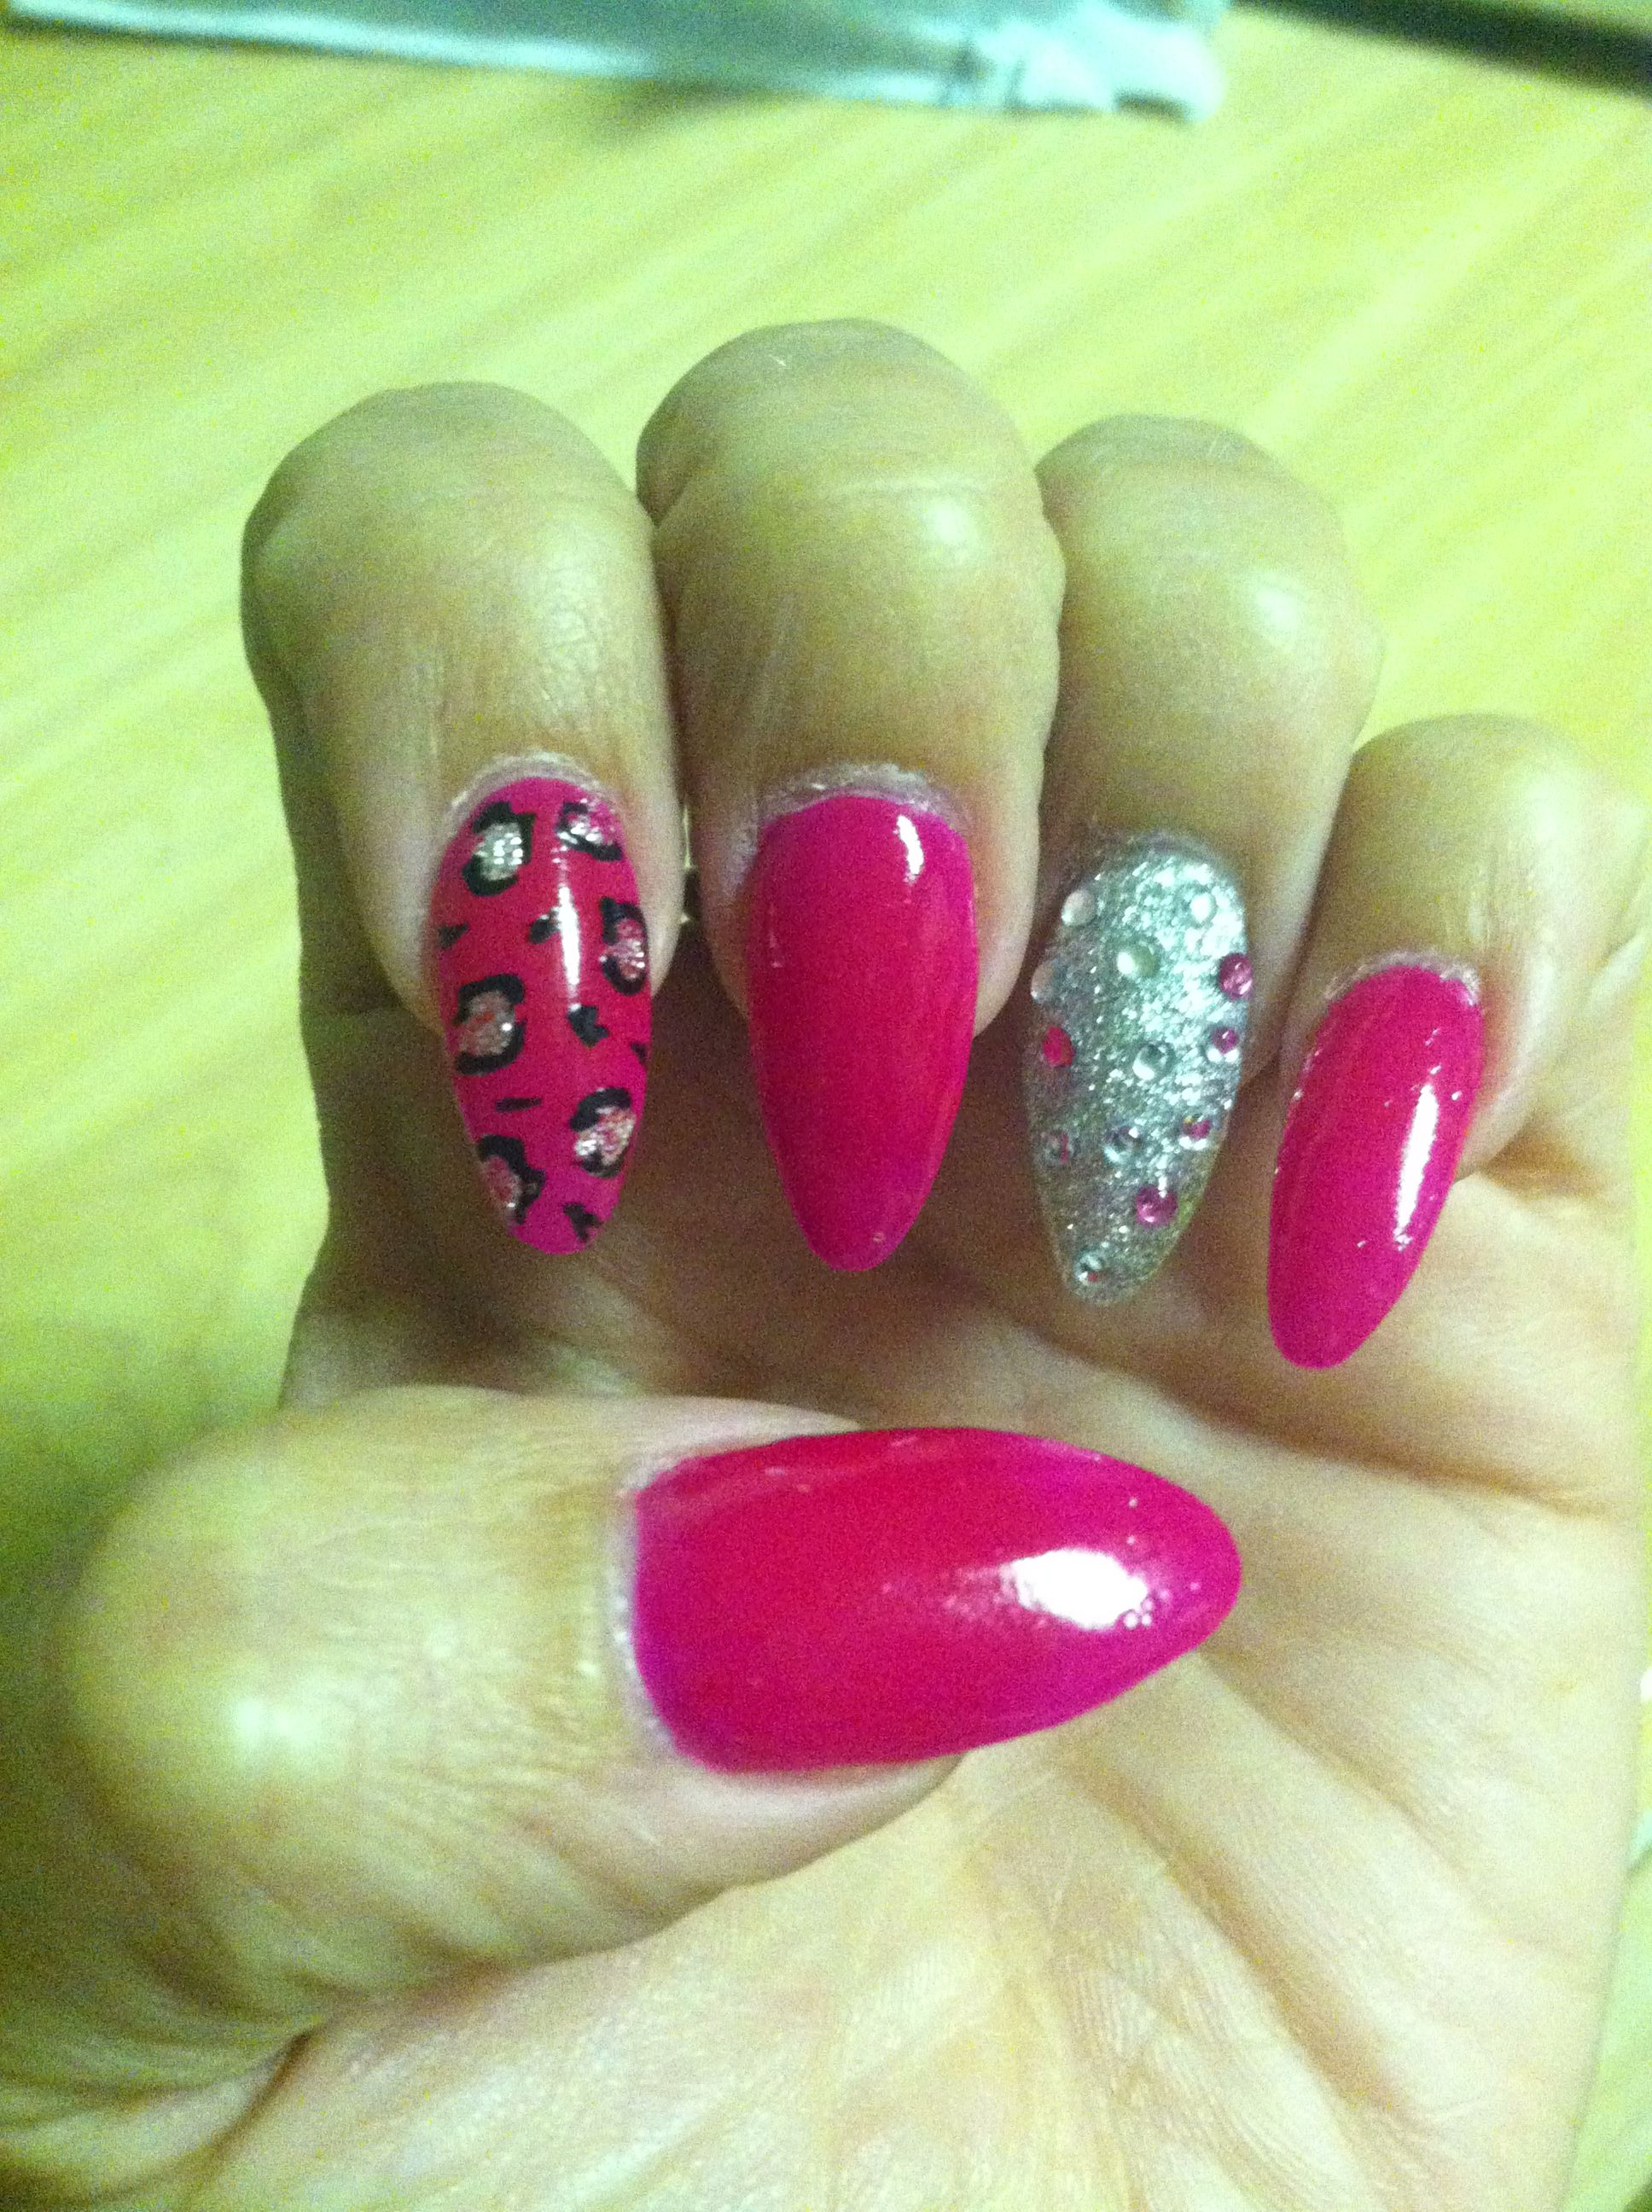 Stilettos Pink Nails Silver Nails Glitter Nails Bling Nails Leopard Nails Fun Colorful Trendy Davi Nails Jennie Ulrich Henrie Dierenprints Luipaard